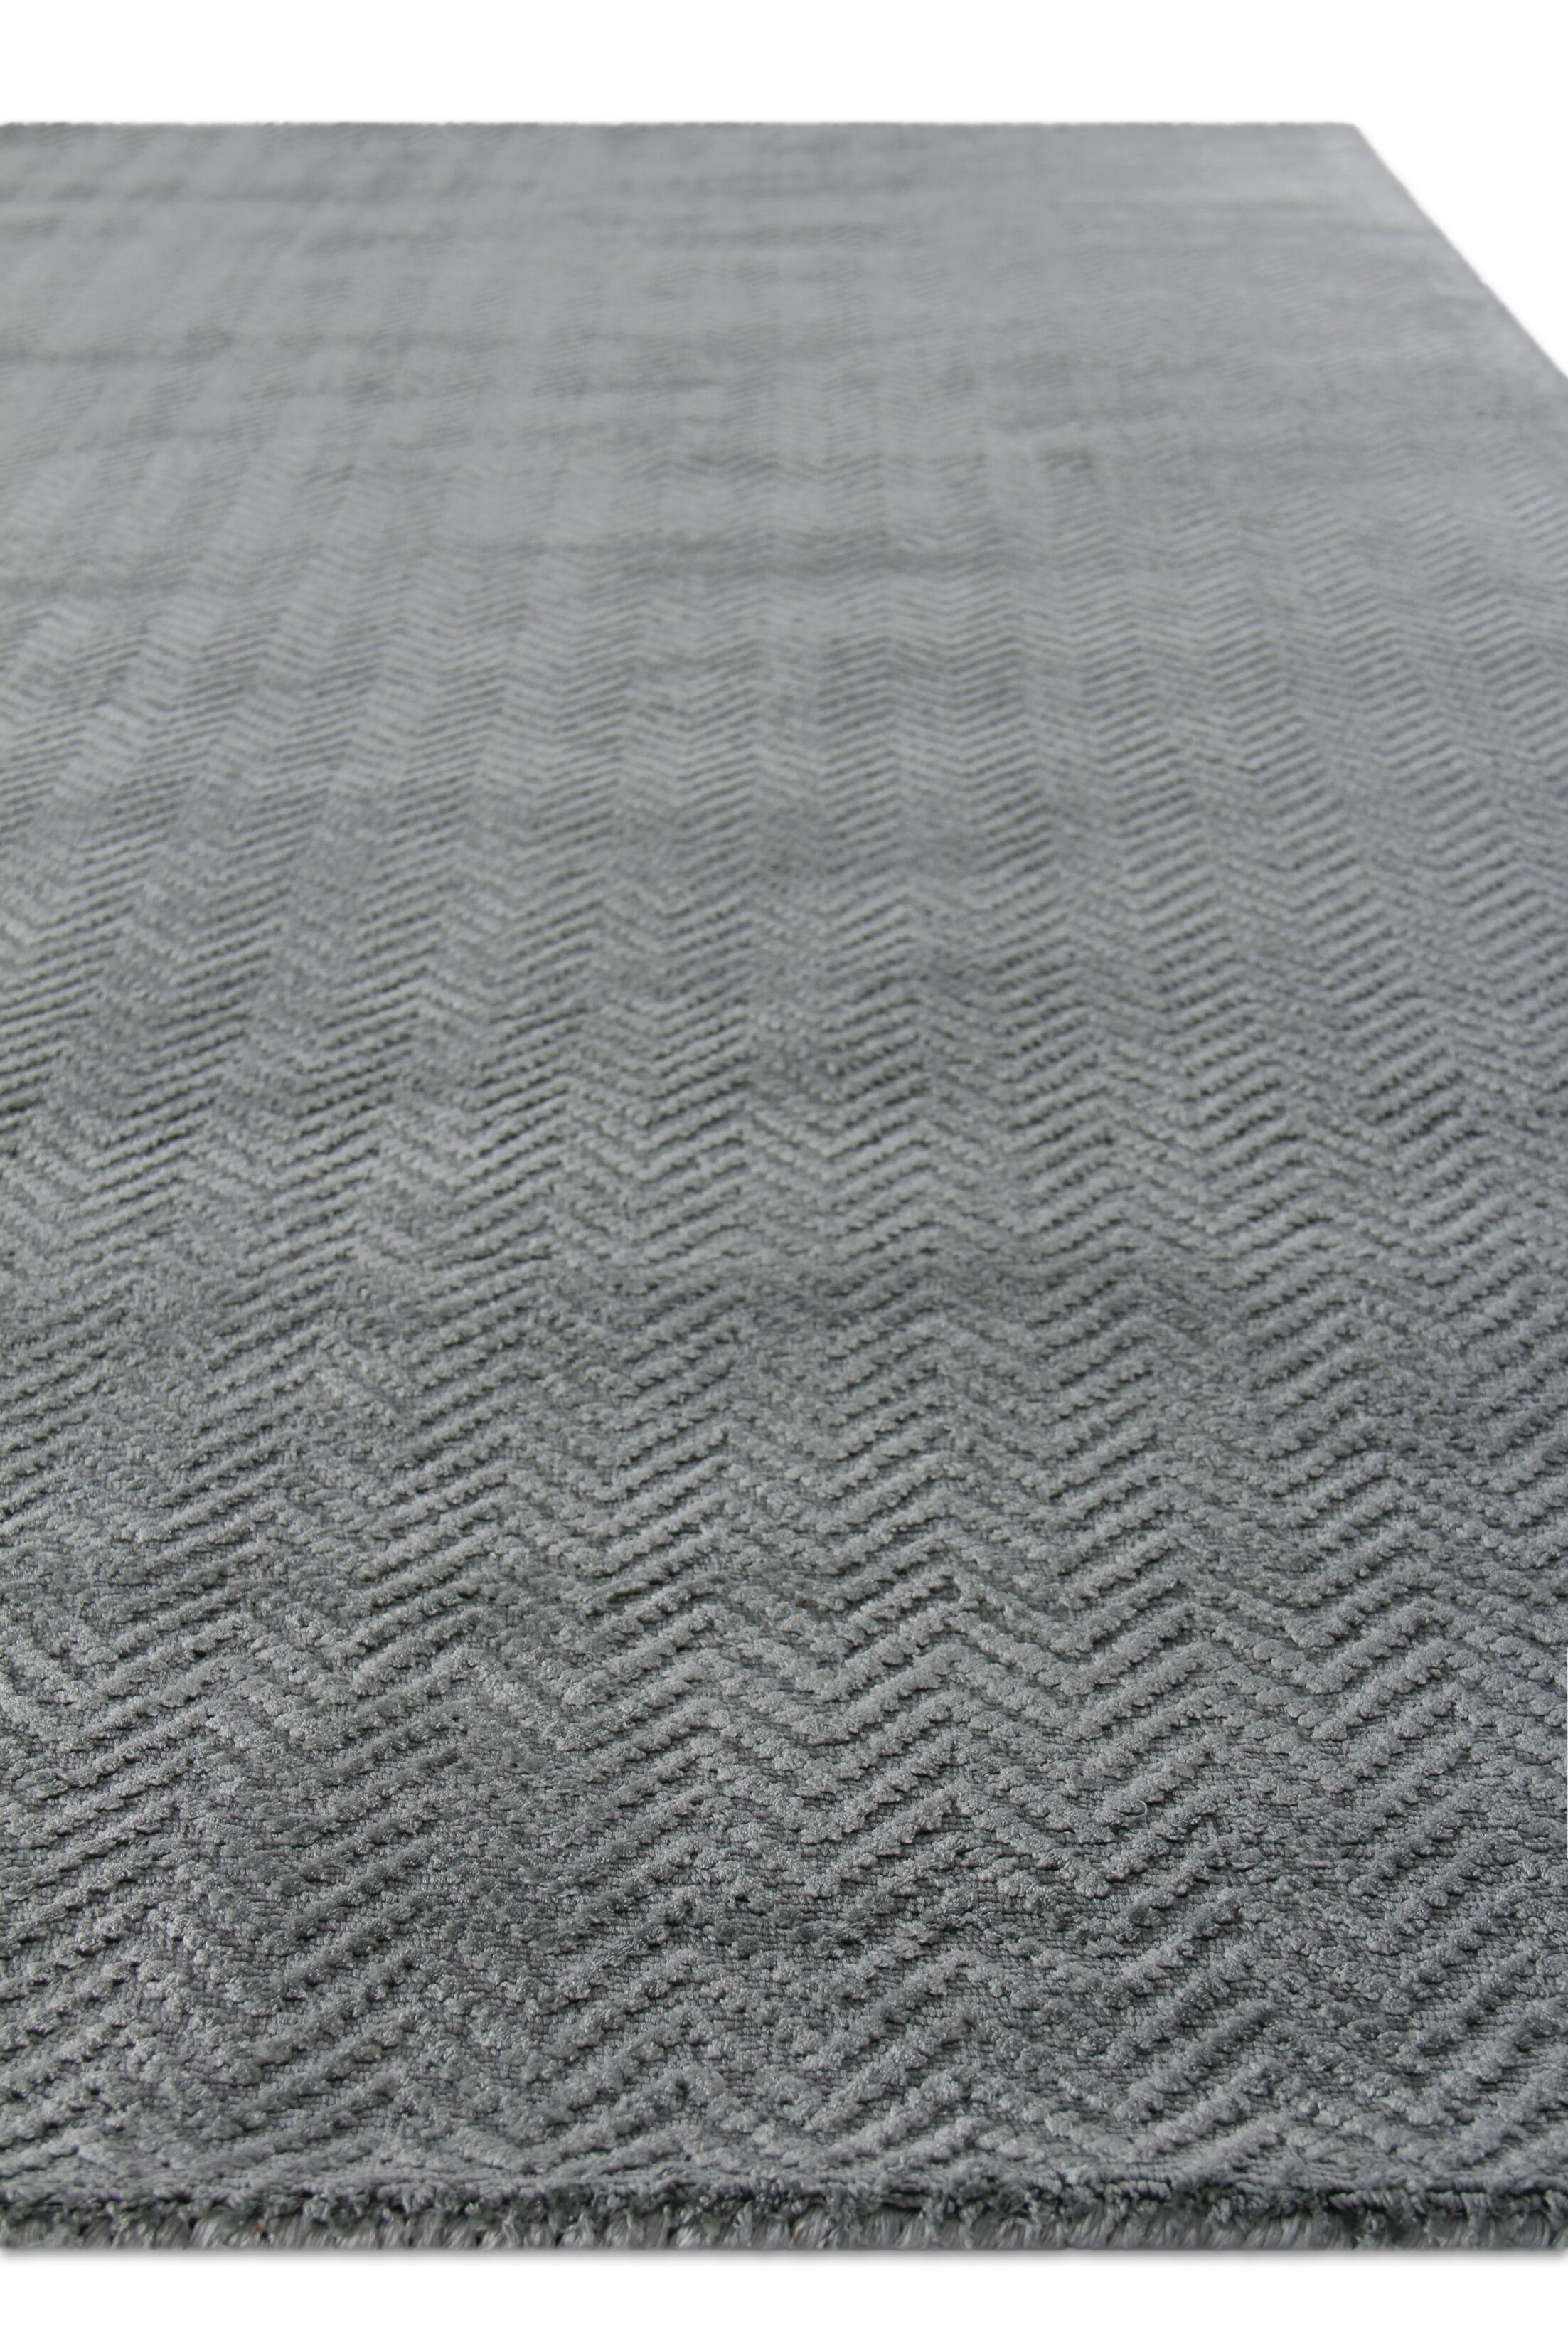 Pavo Hand-Woven Gray Area Rug Rug Size: Rectangle 9' x 12'